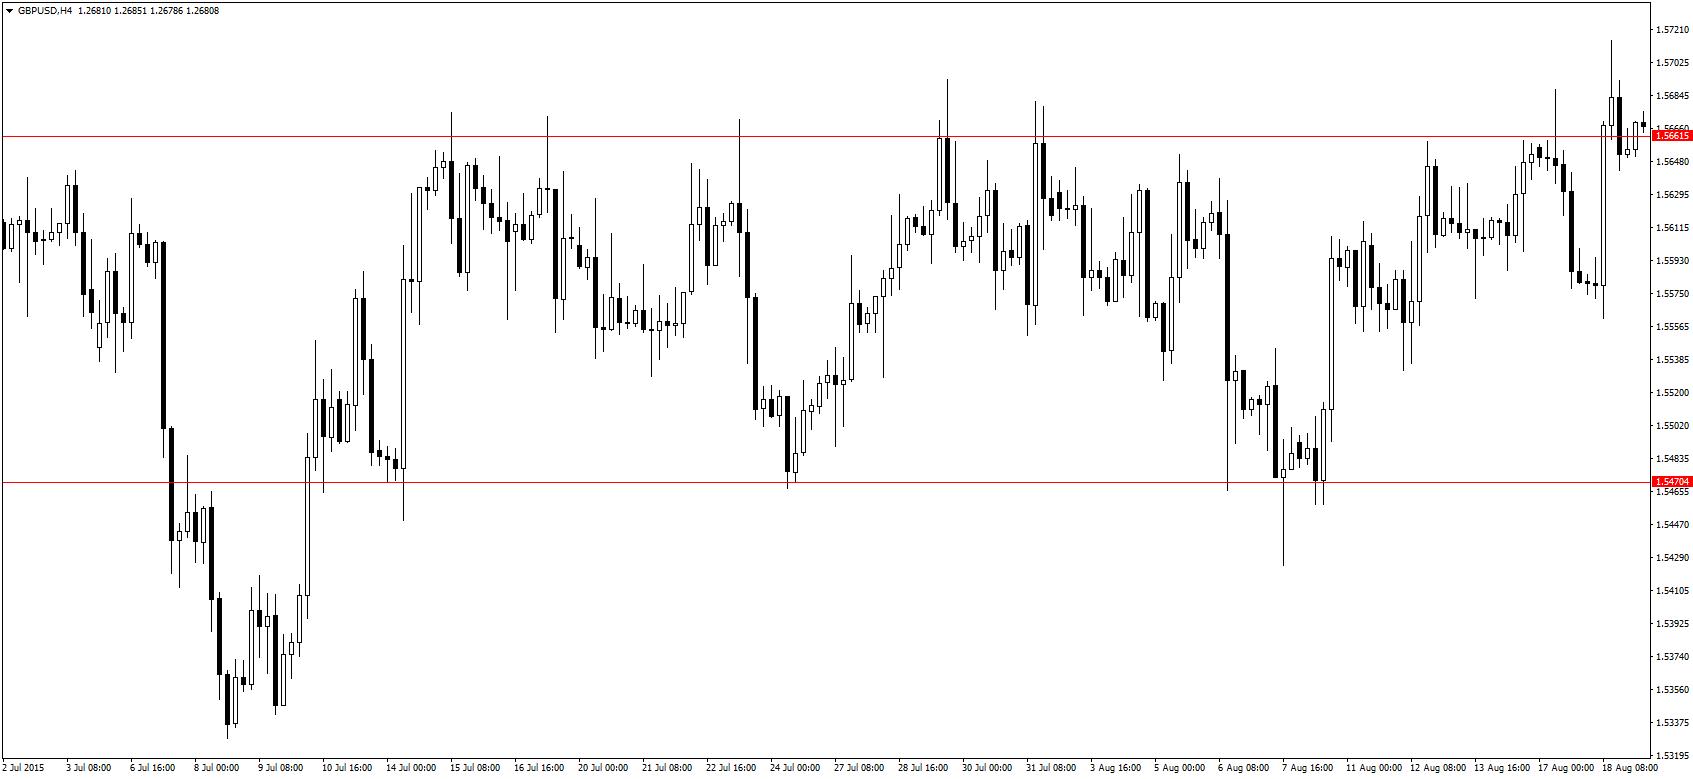 Pullback trading strategies